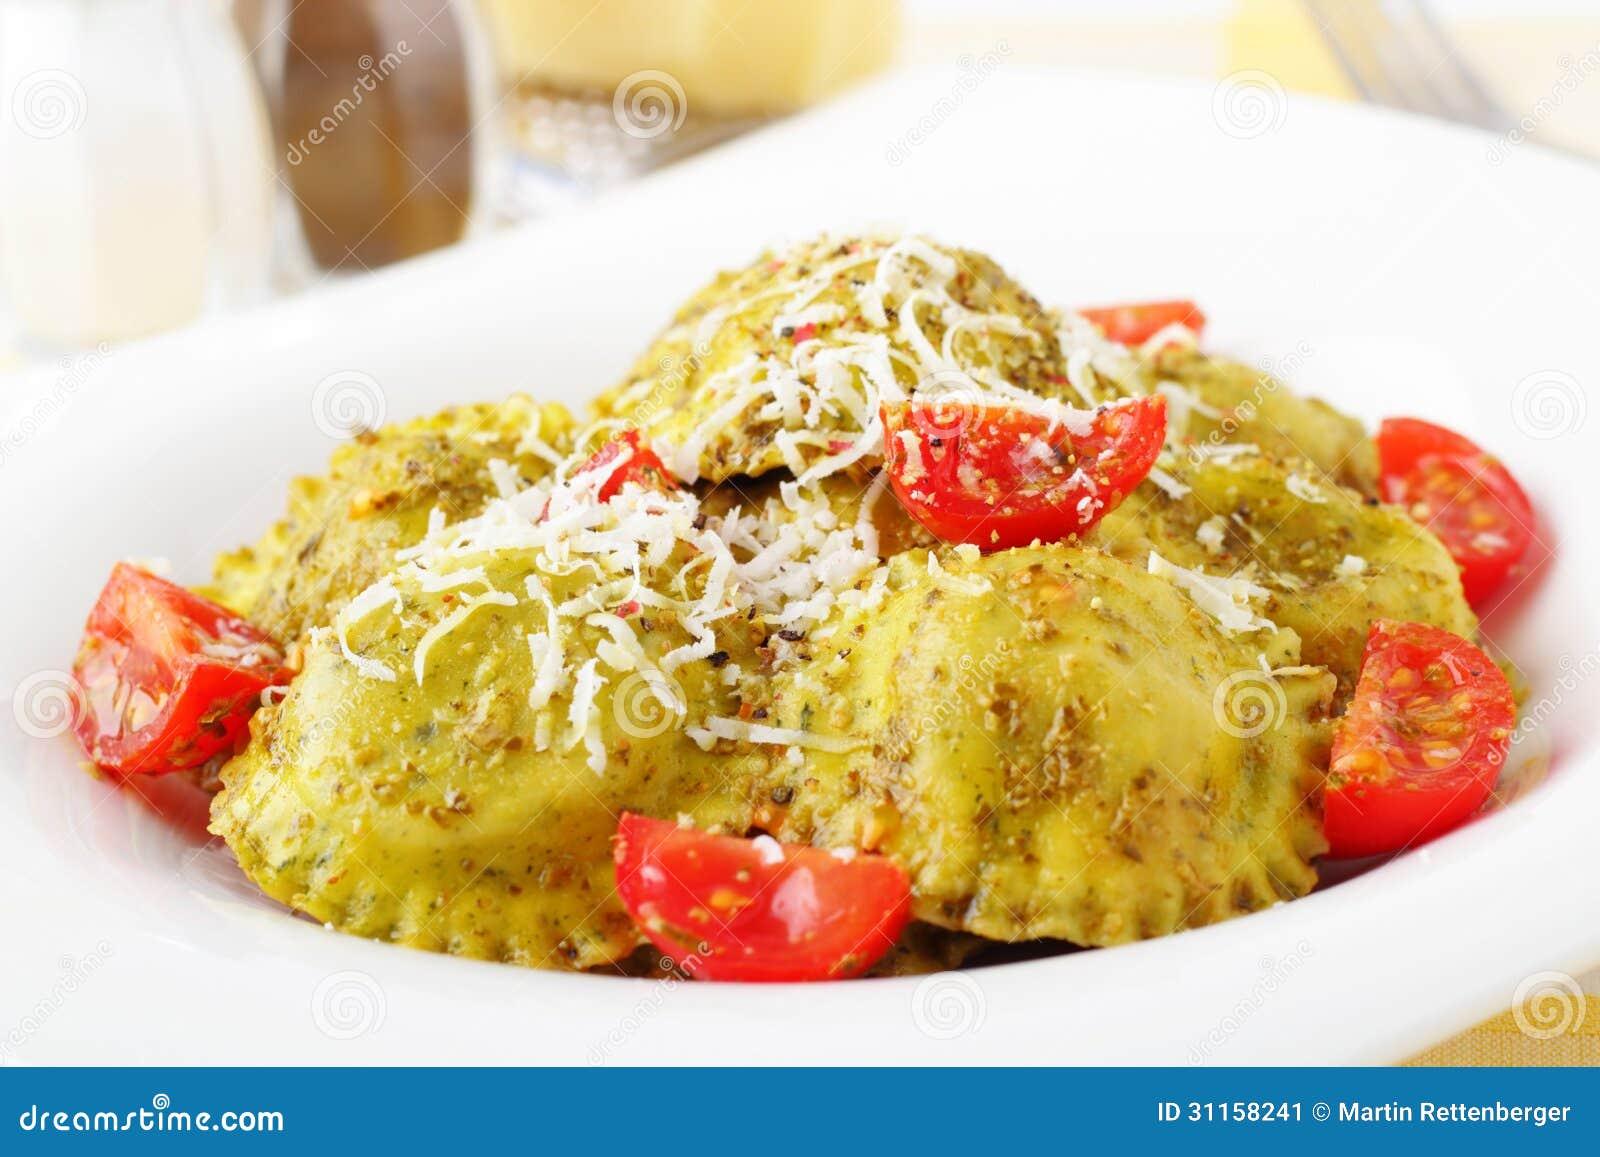 ravioli cupcakes thanksgiving leftovers ravioli red pesto ravioli